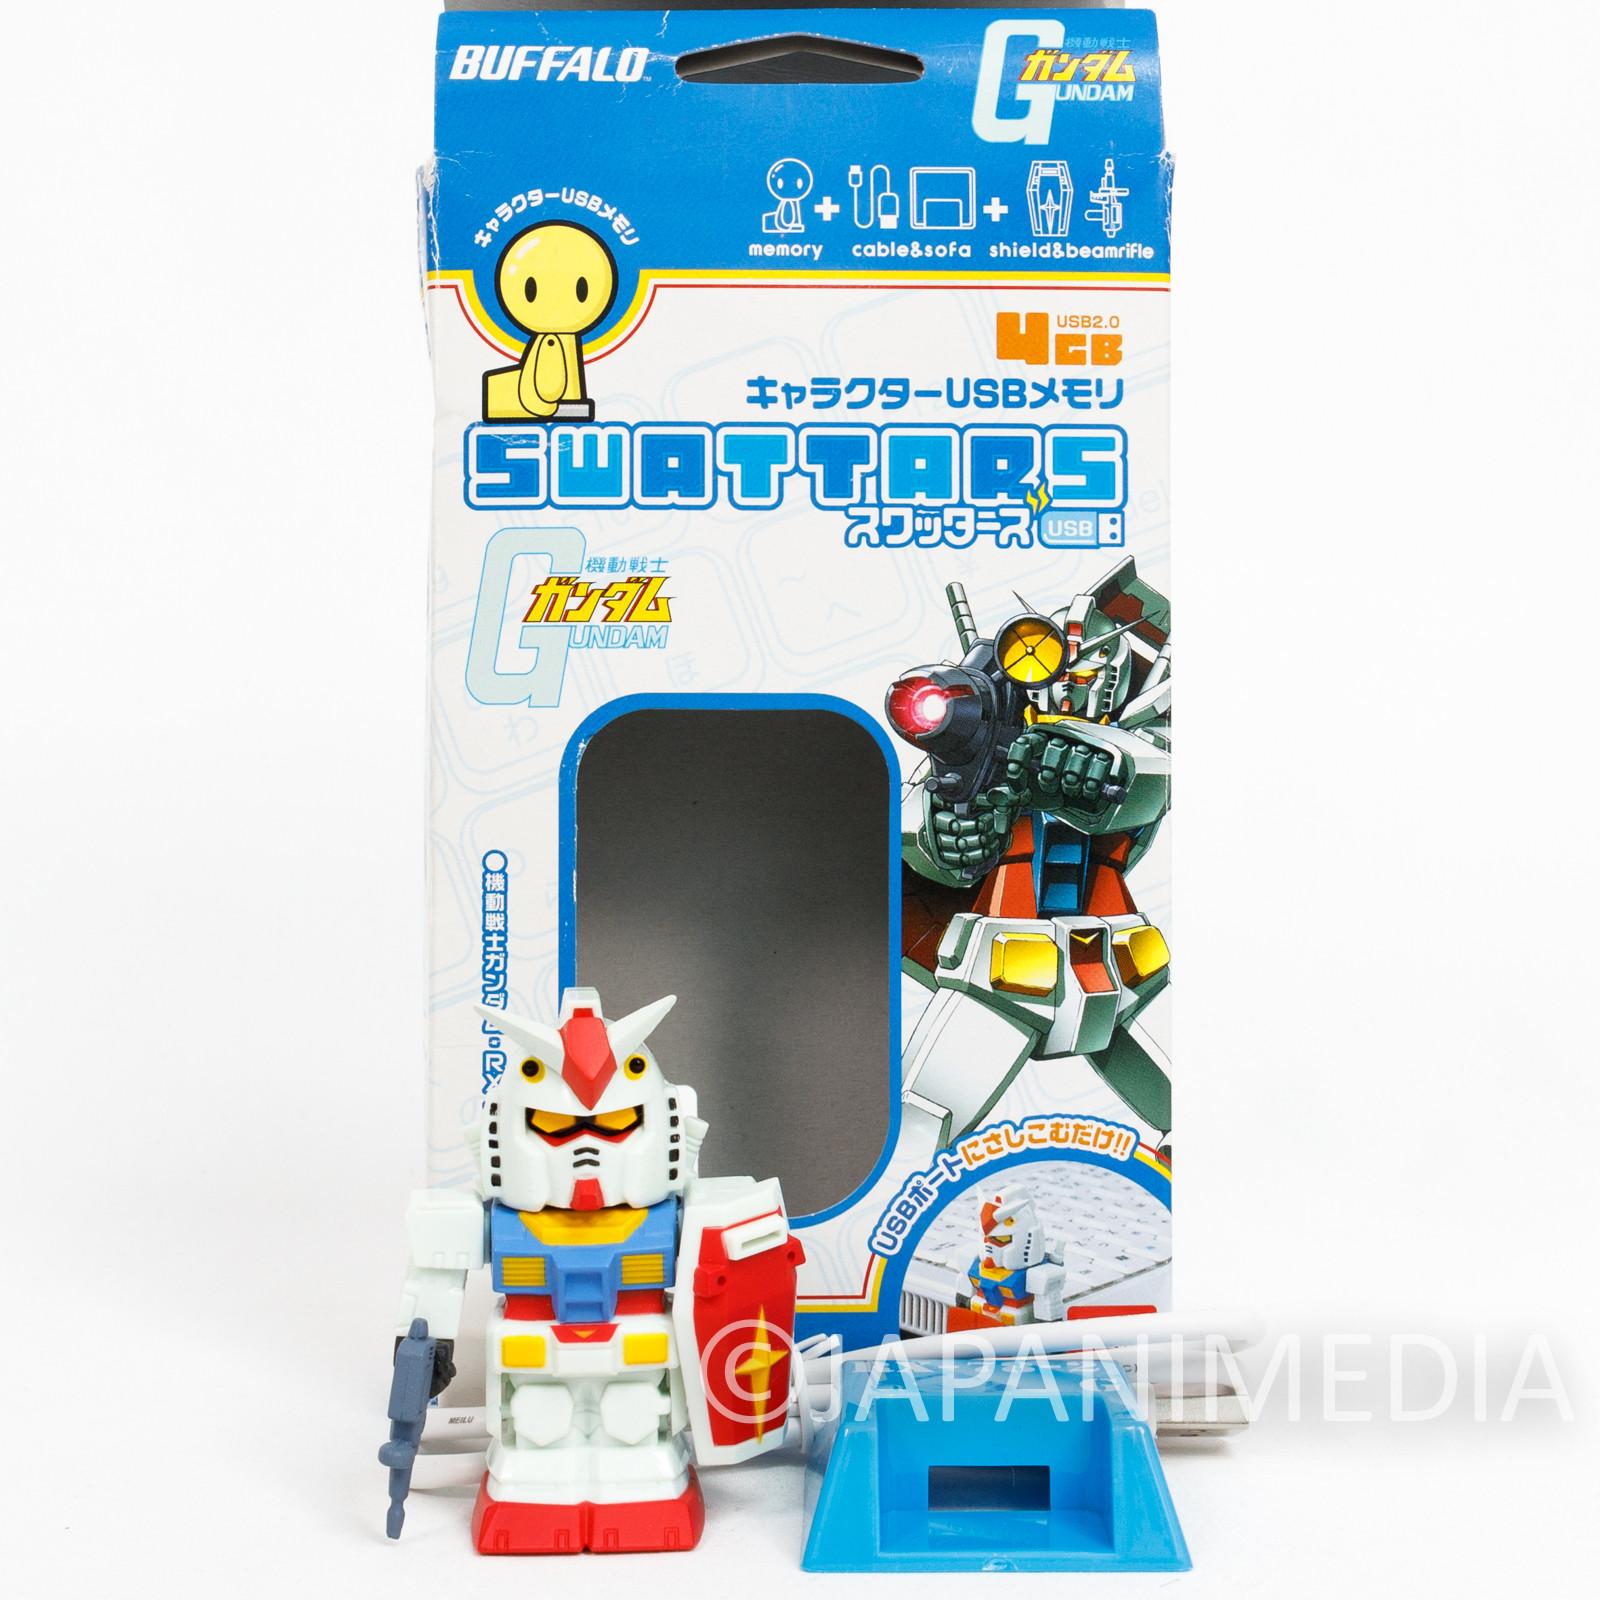 Gundam RX-78 Figure Type USB Flash Memory 4GB Buffalo JAPAN